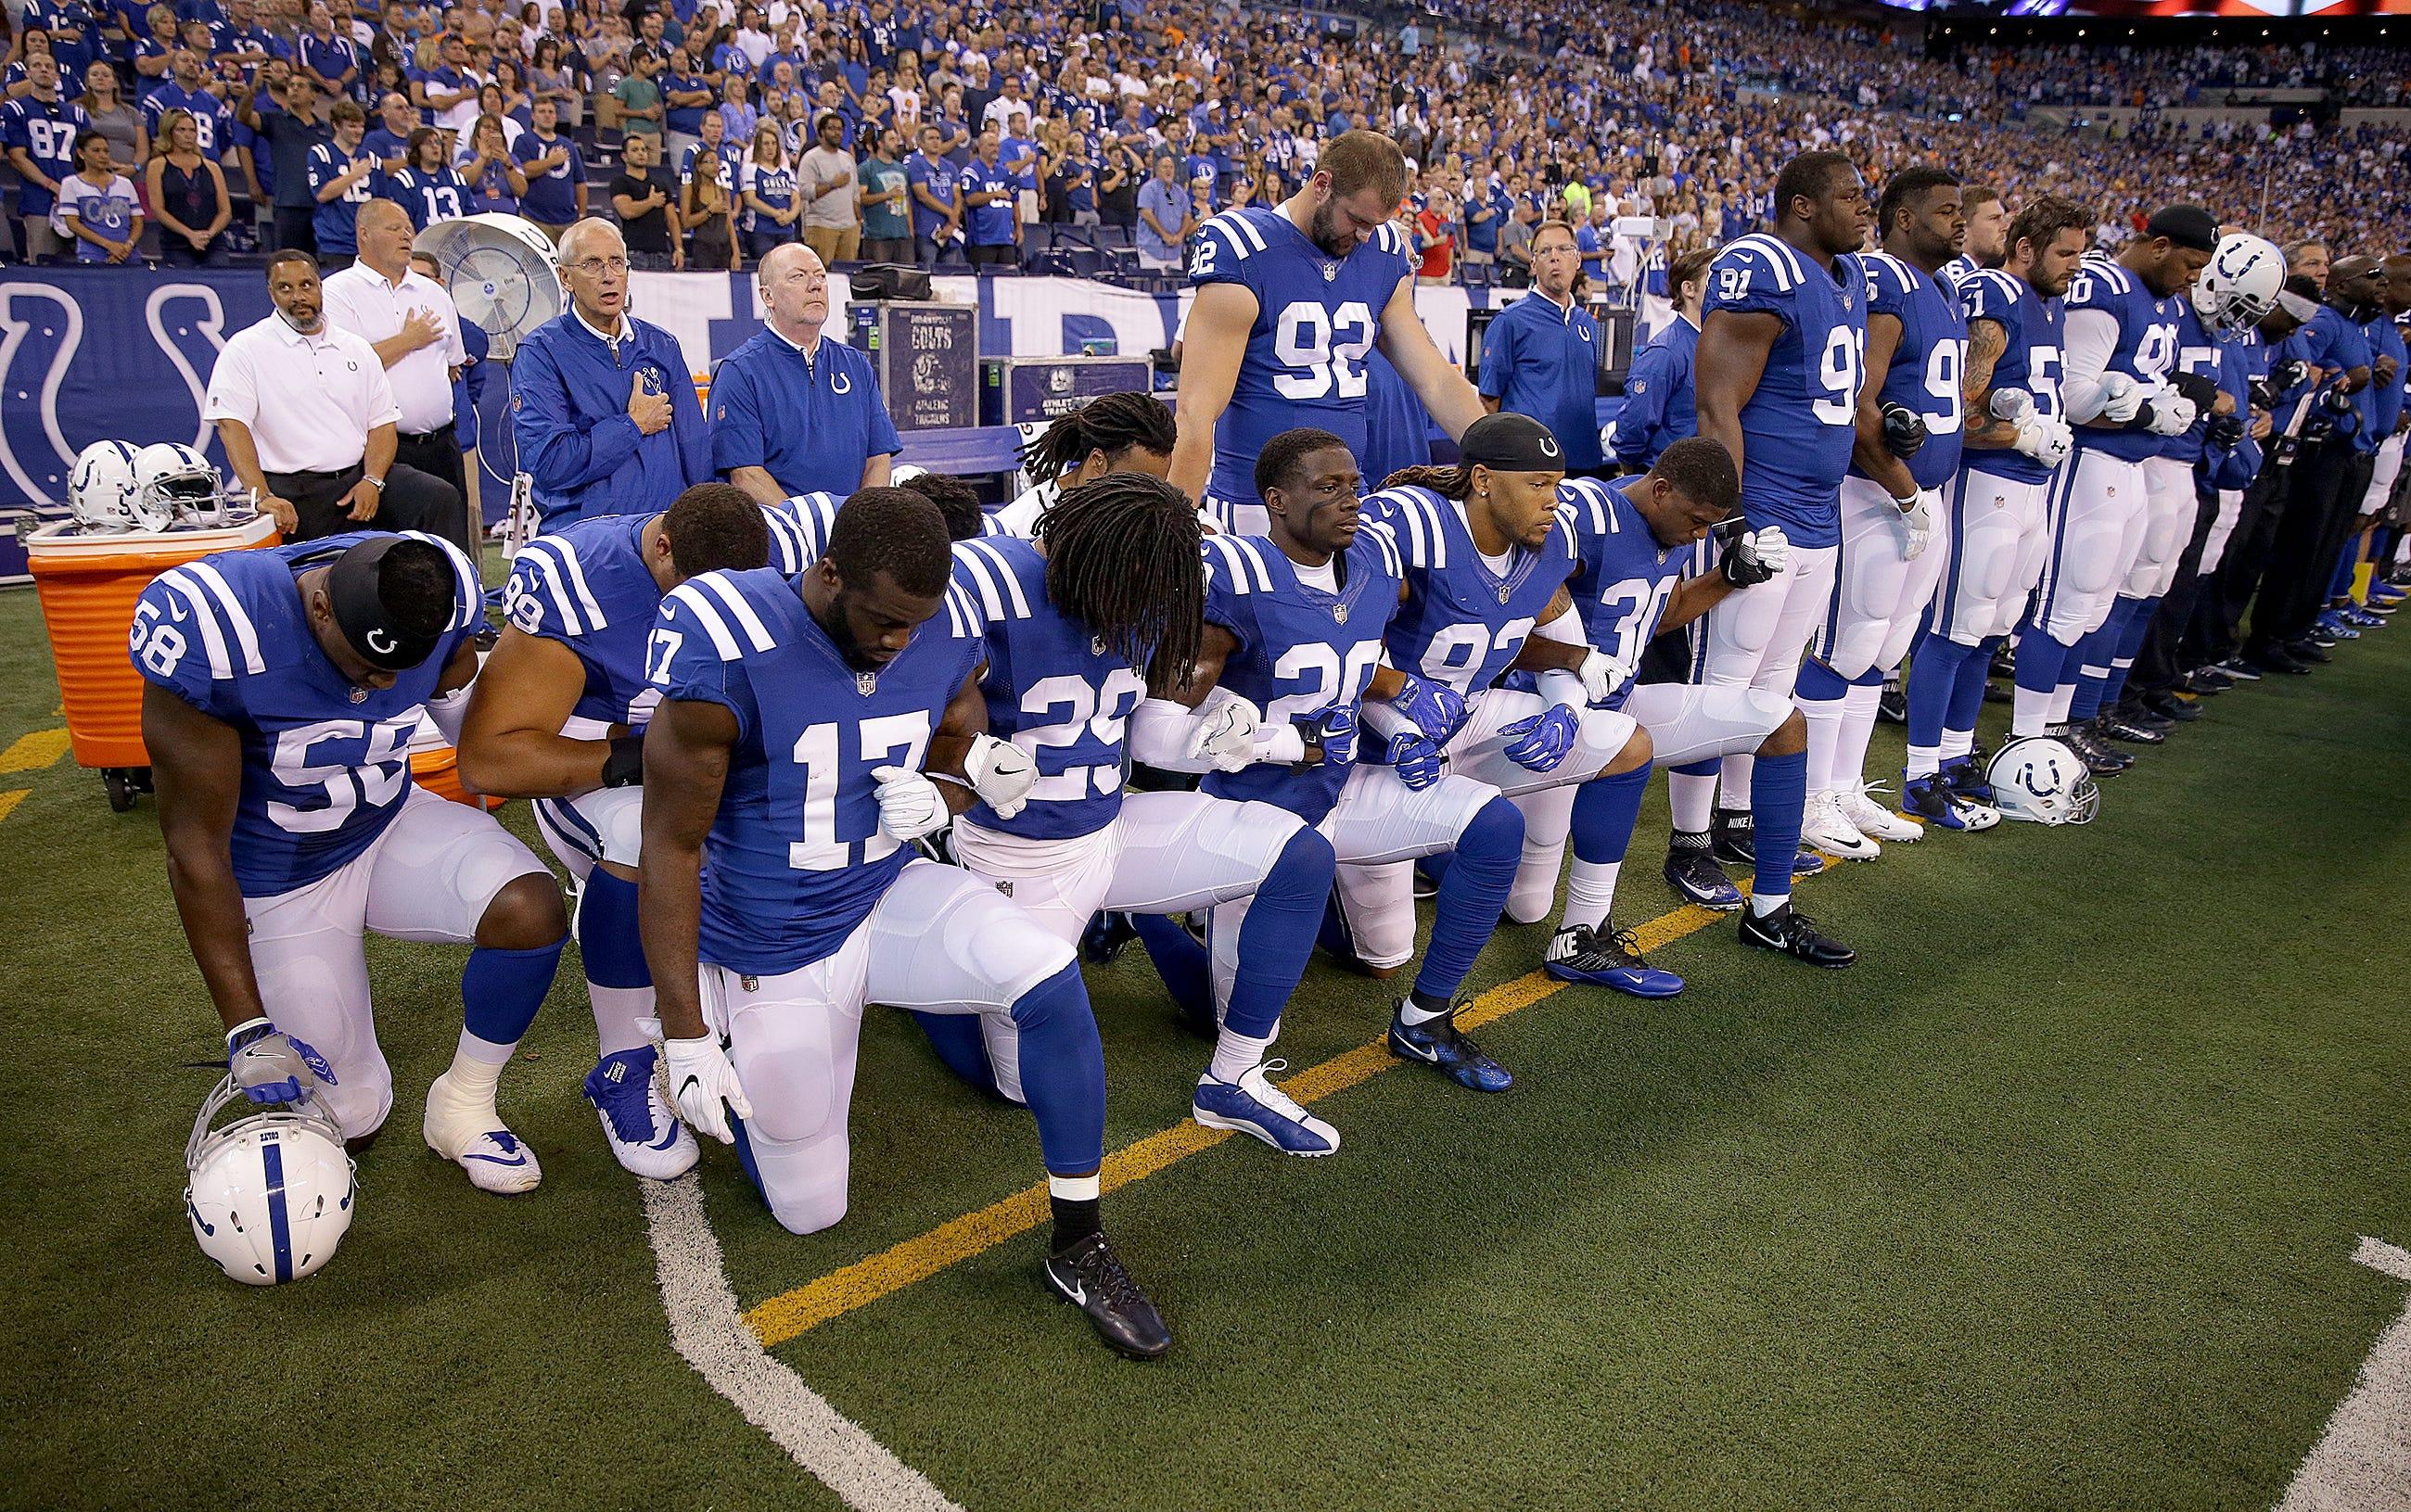 NFL new national anthem kneeling policy enslaves black players, fans